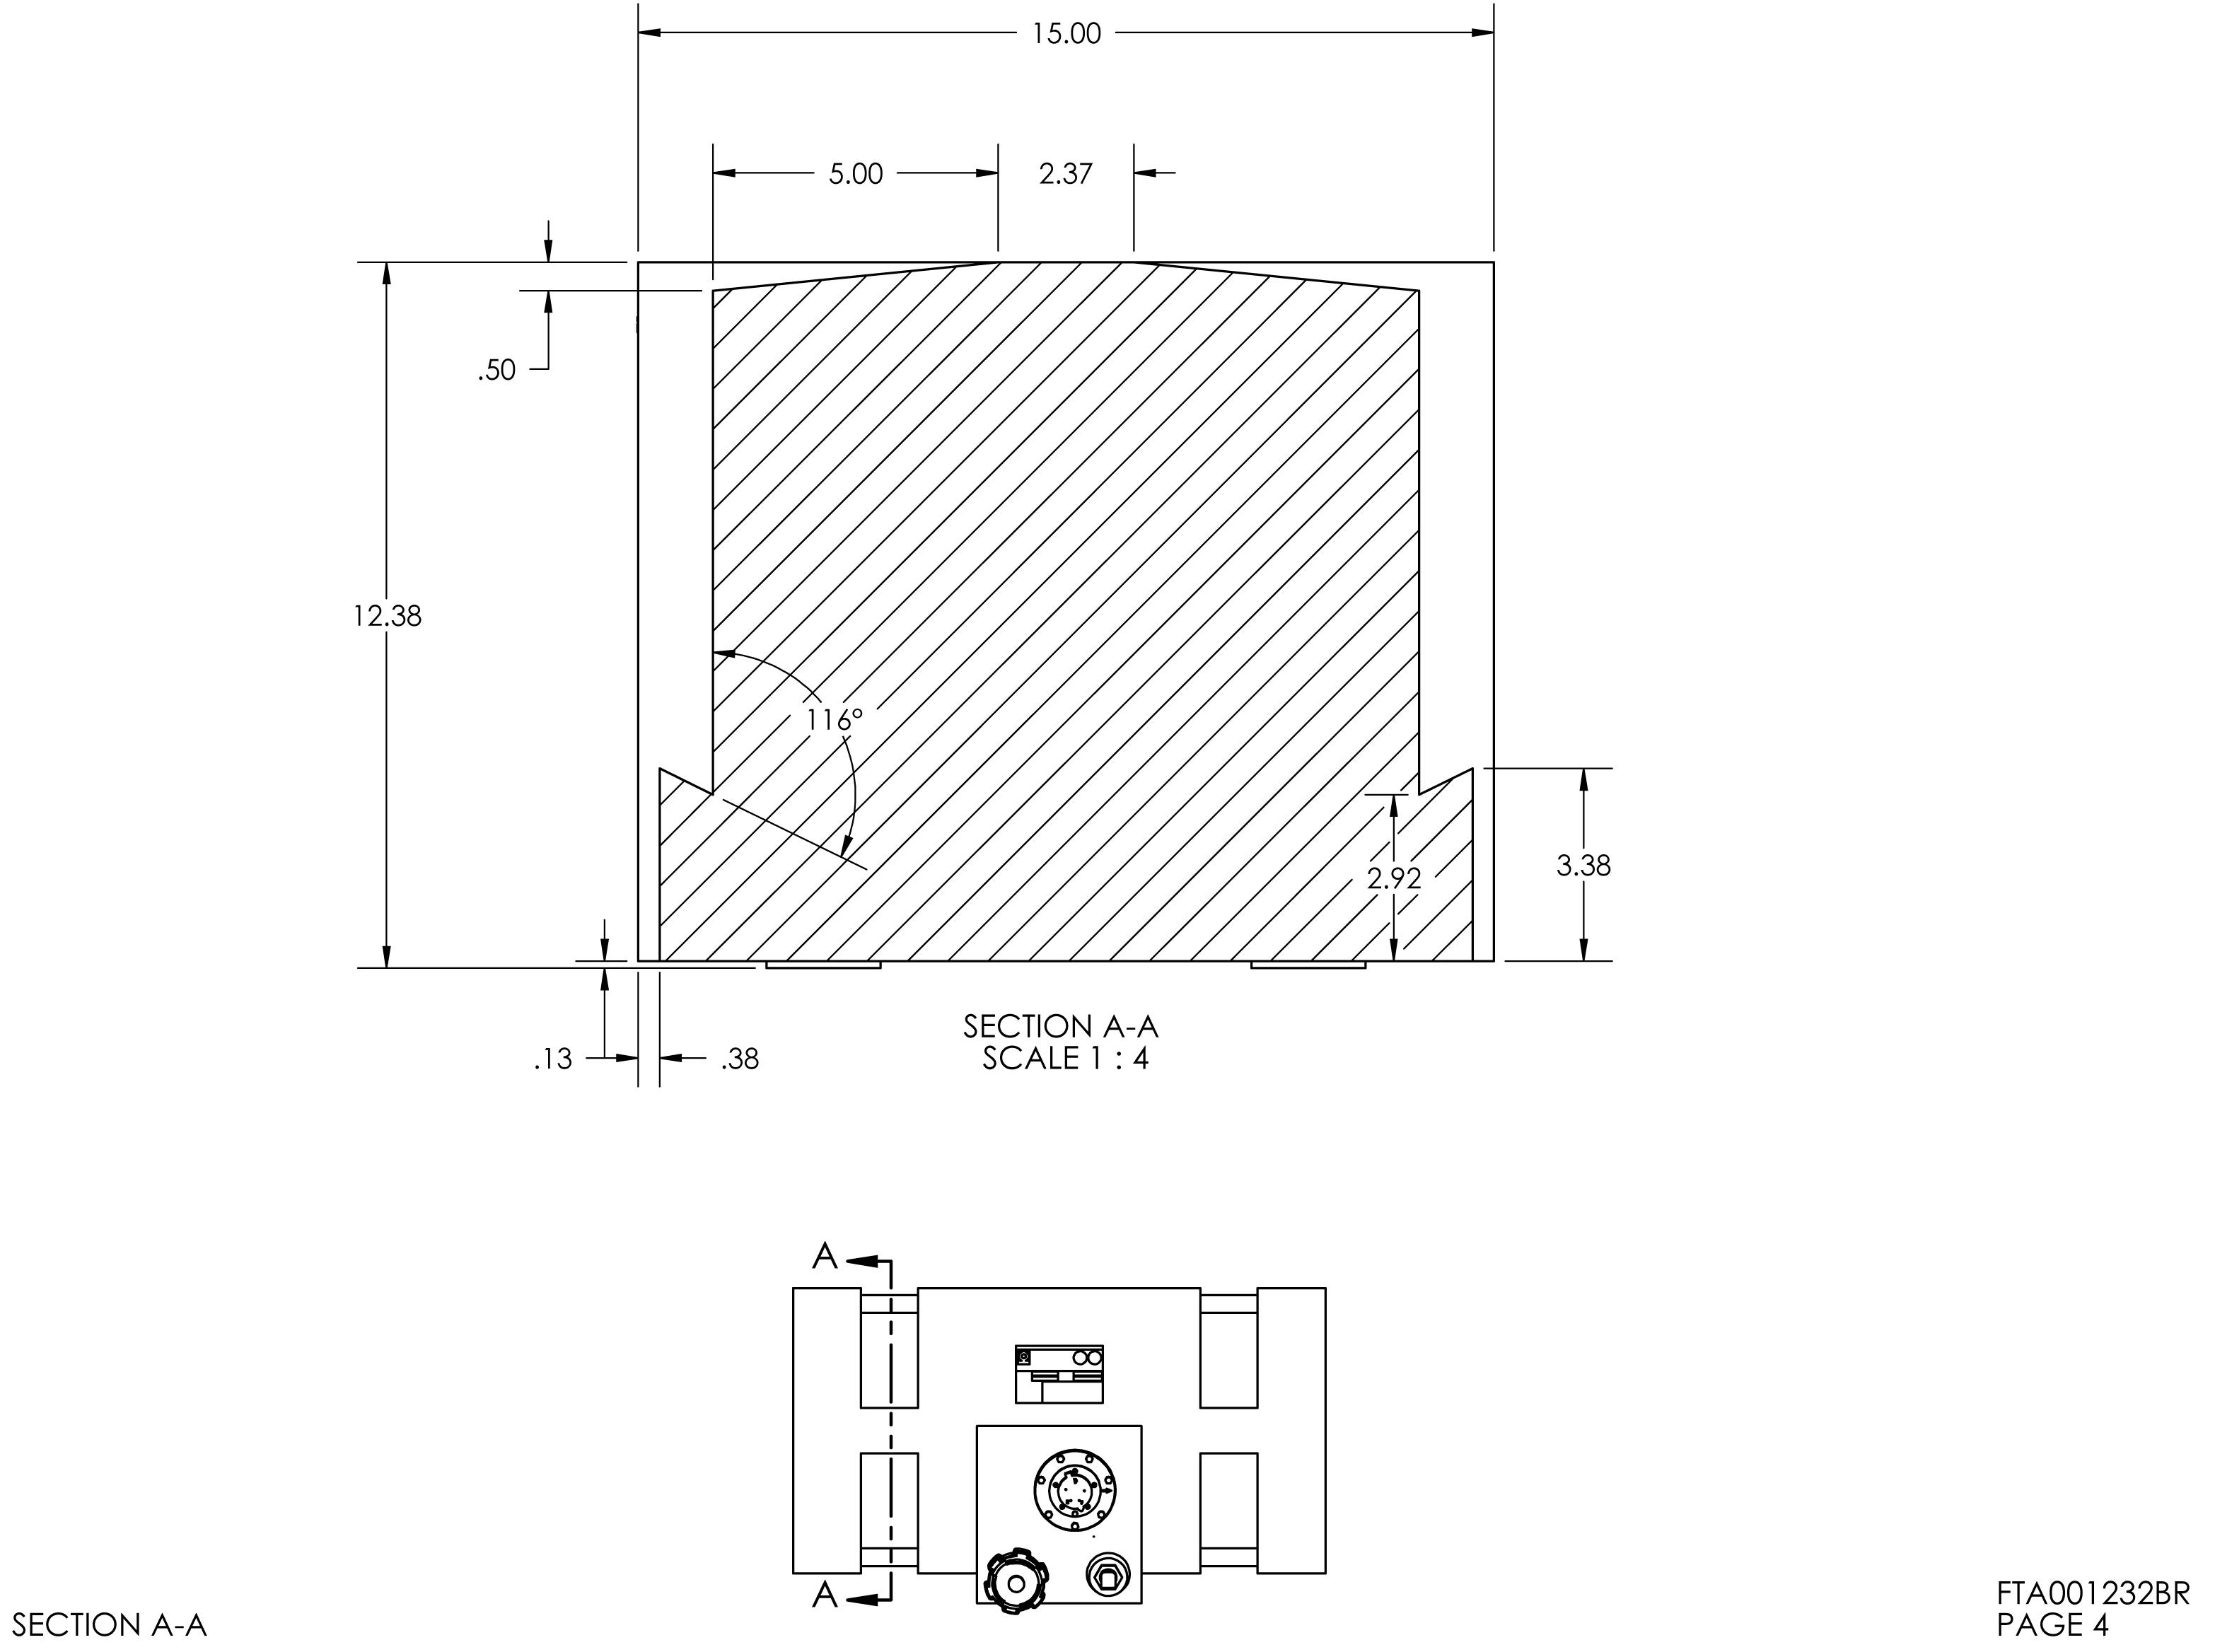 18 Gallon Rectangular Shaped Fuel Tank 28 X 15 X 12 38